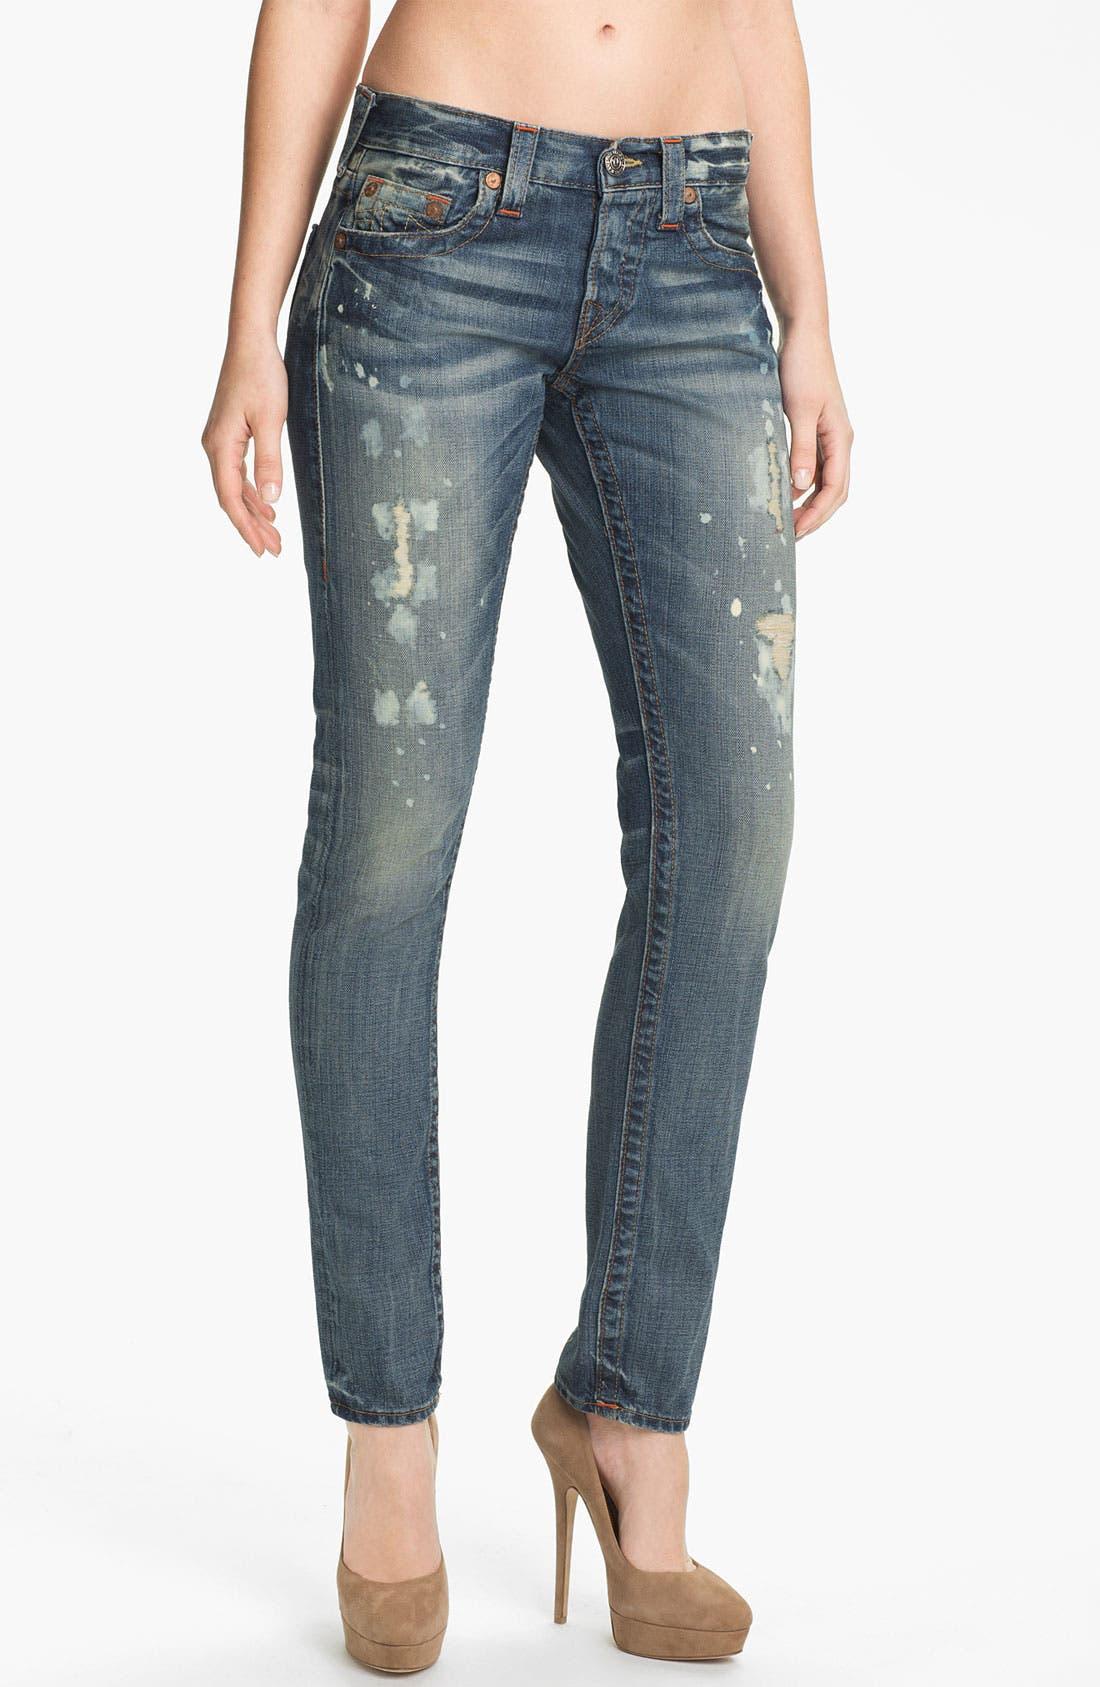 Alternate Image 1 Selected - True Religion Brand Jeans 'Brianna' Boyfriend Jeans (Black Water)